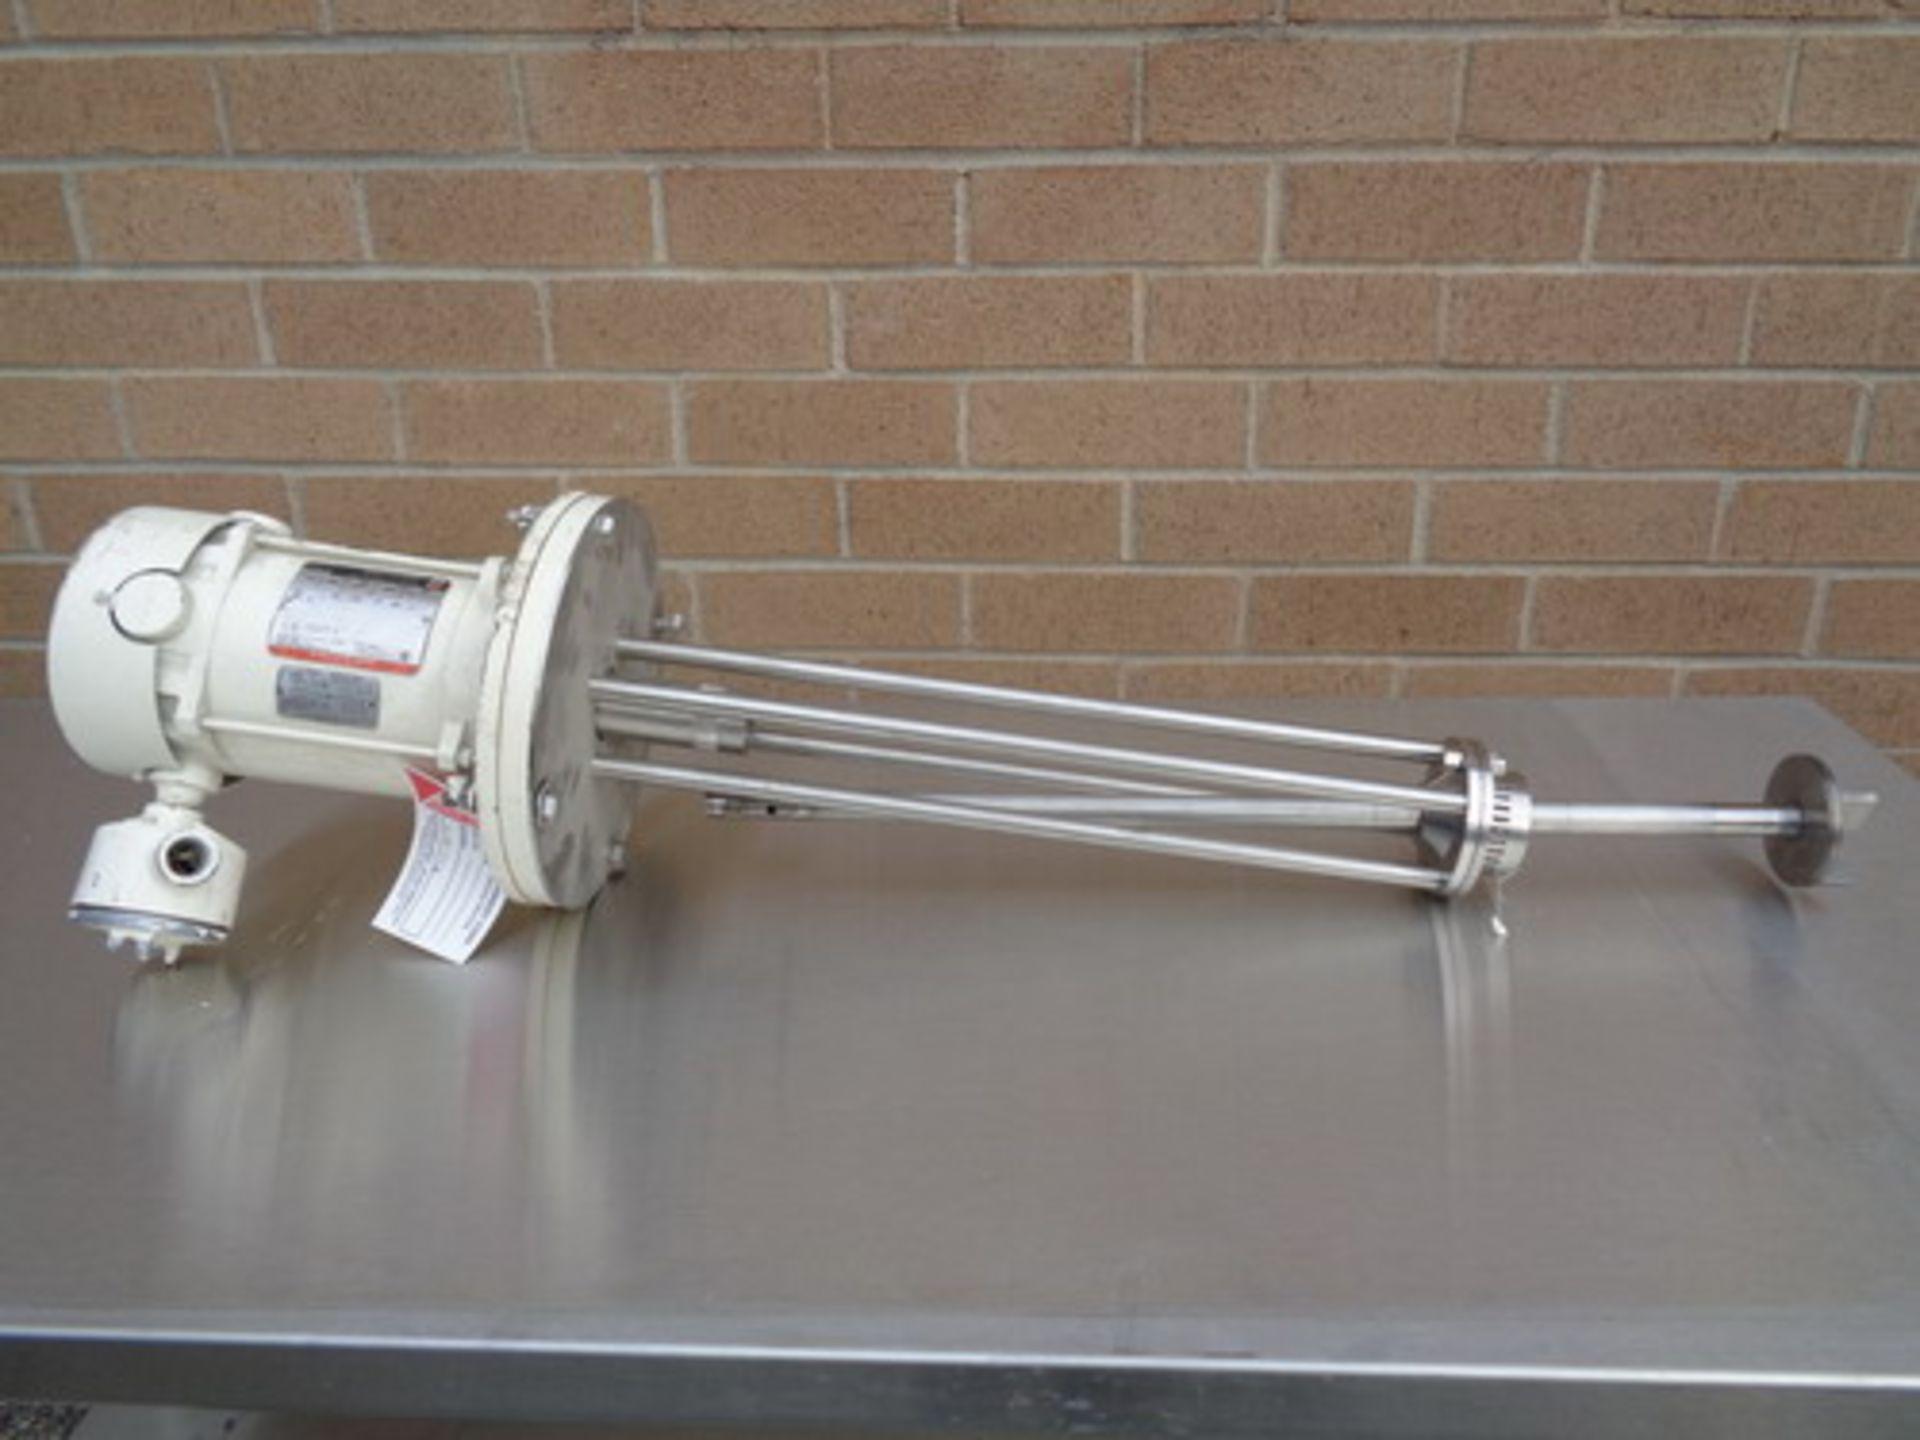 Lot 135 - Ross 1.5HP High Speed Explosion Proof Homomixer